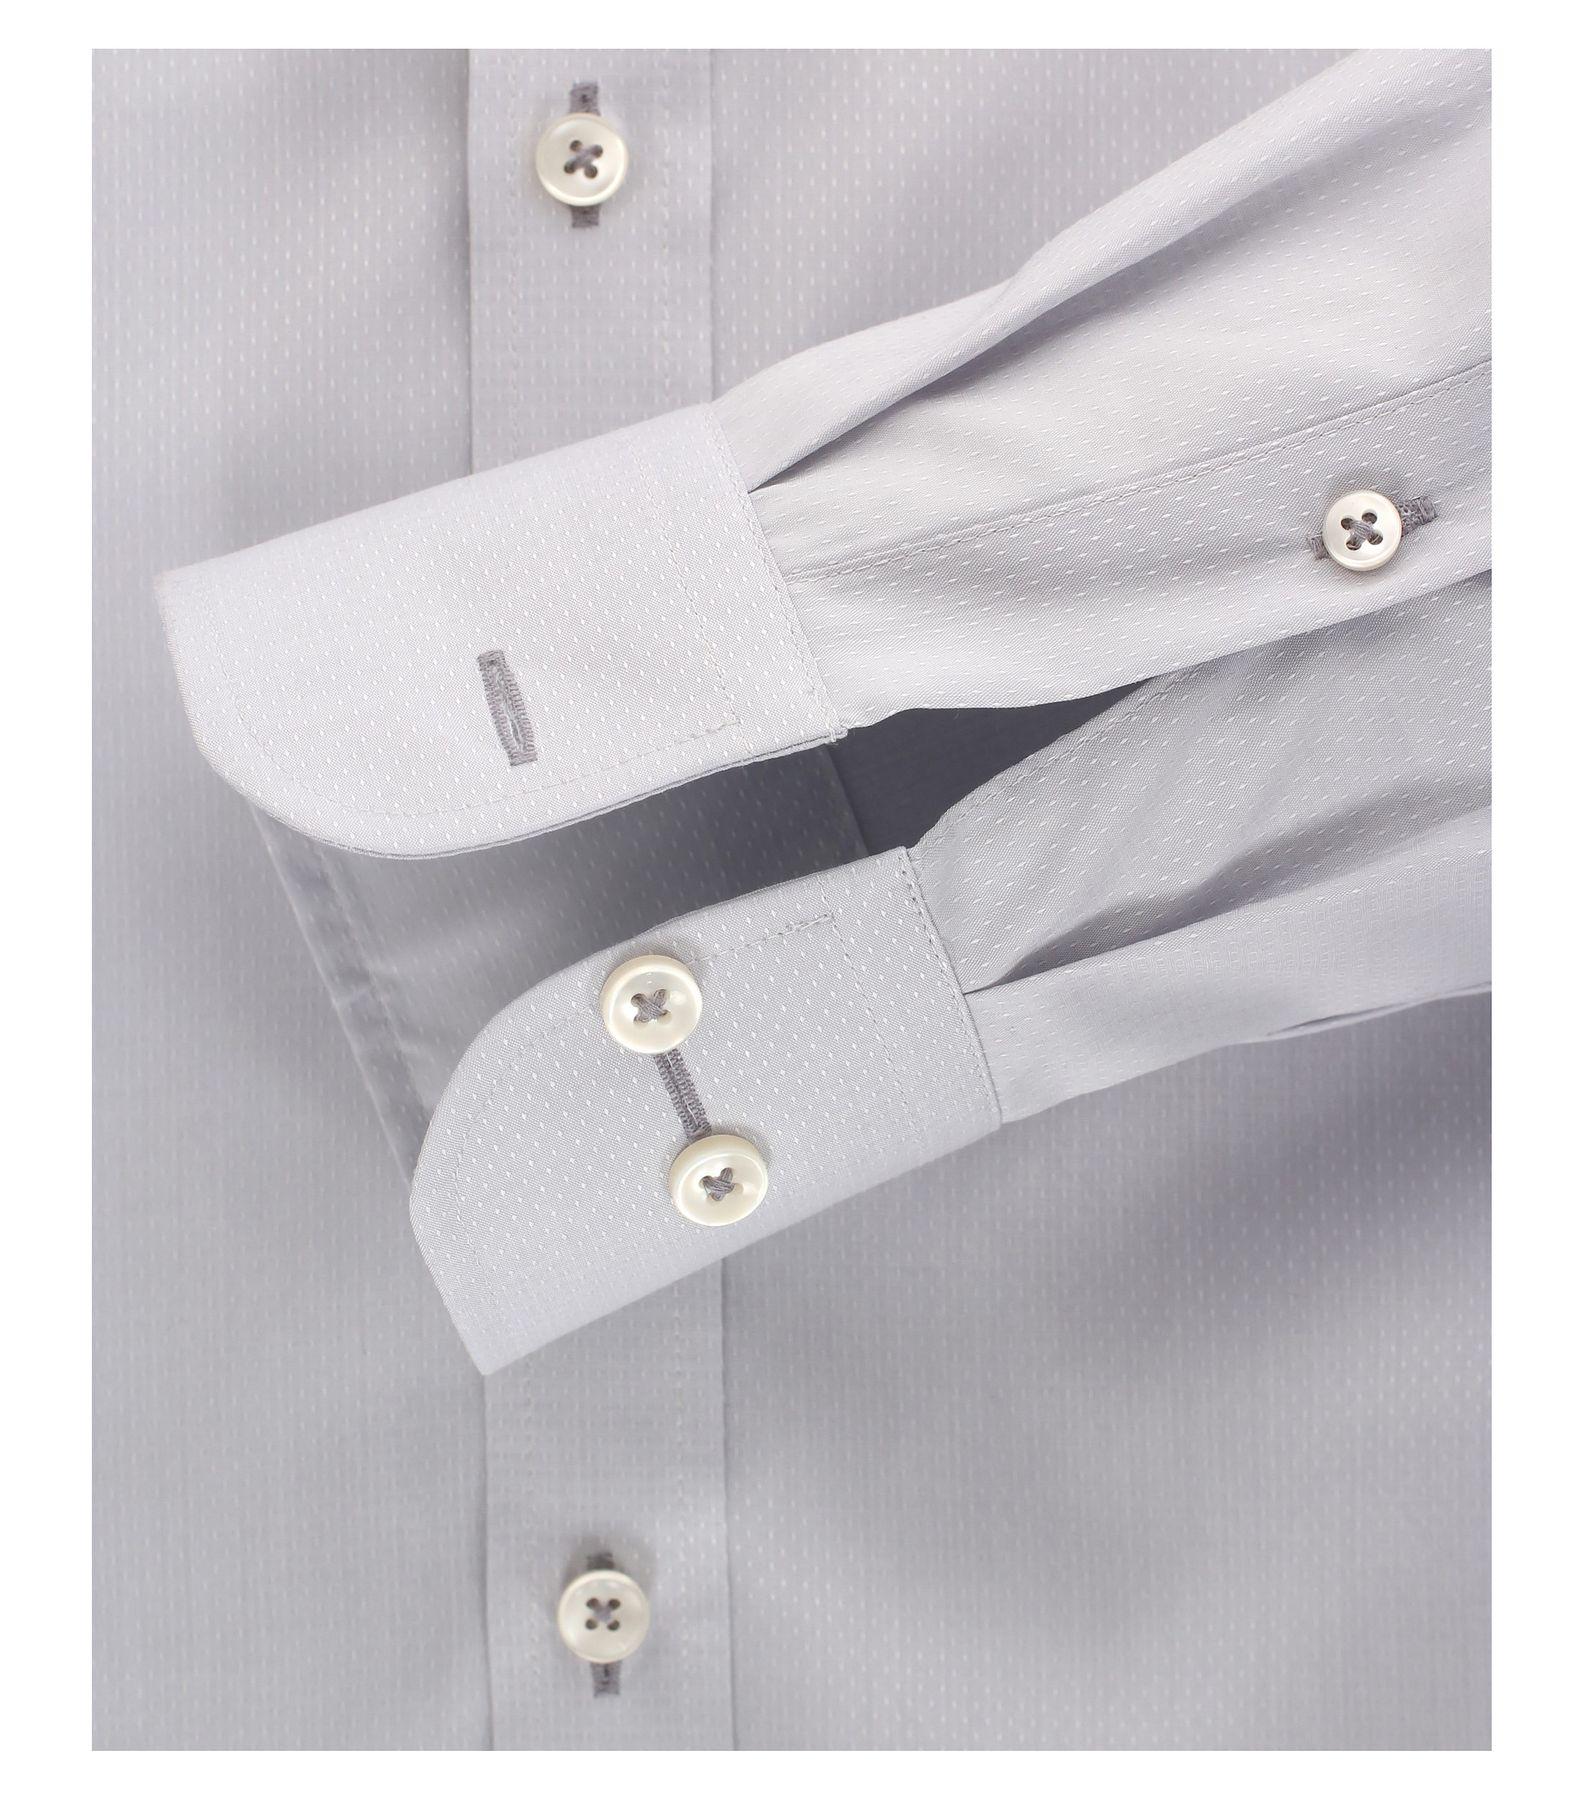 Casa Moda - Modern Fit - Herren langarm Hemd mit Shark Kragen, Uninah (372682600A) – Bild 16